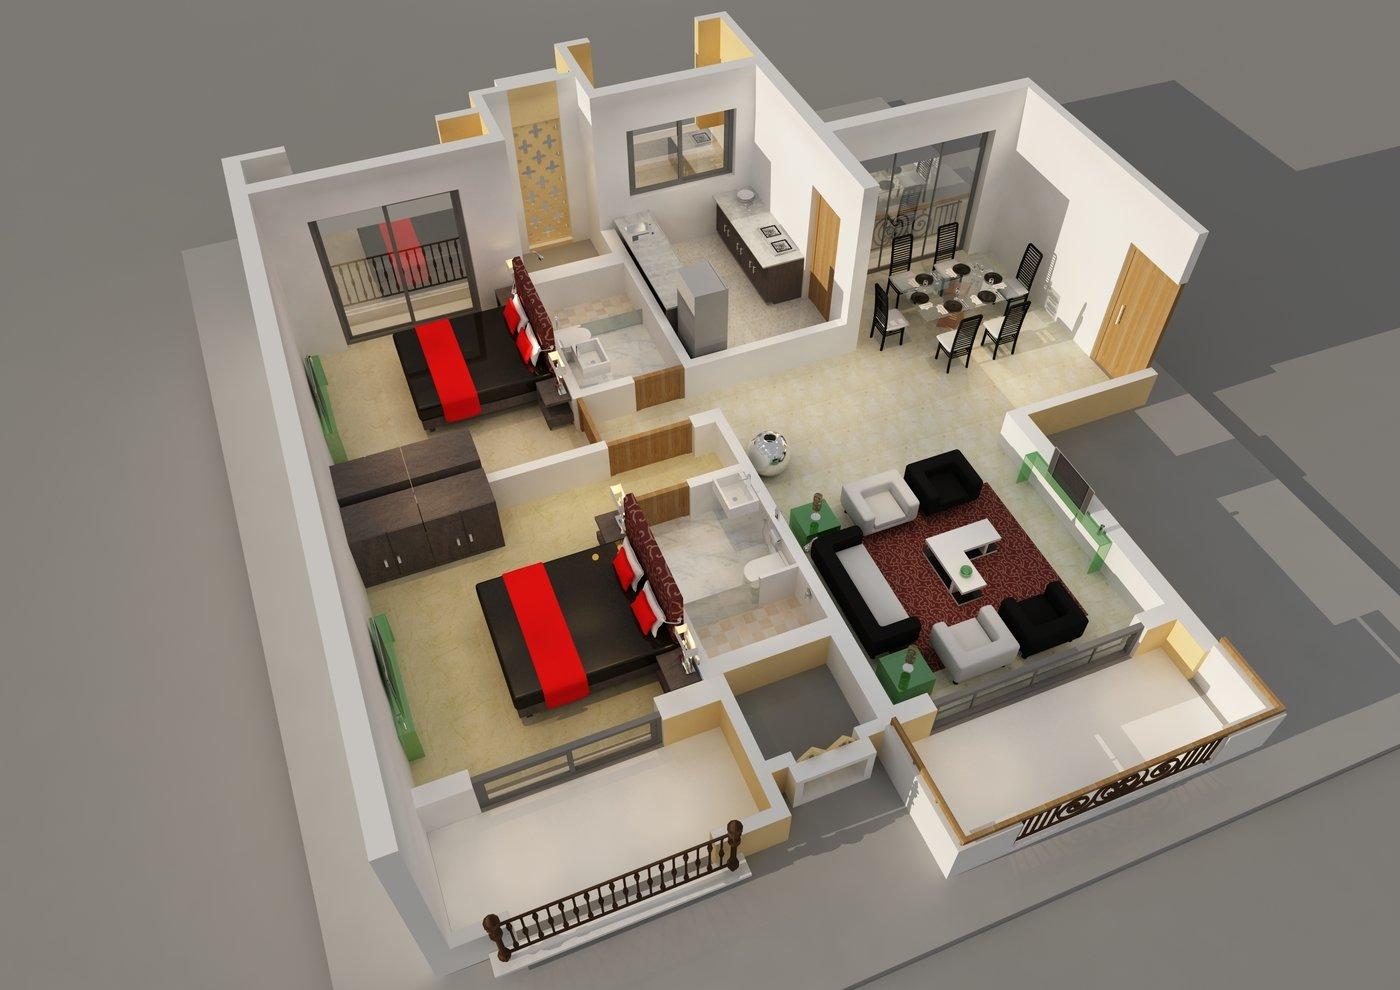 3d Floor Plan By Nayan Kadu At Coroflot Com